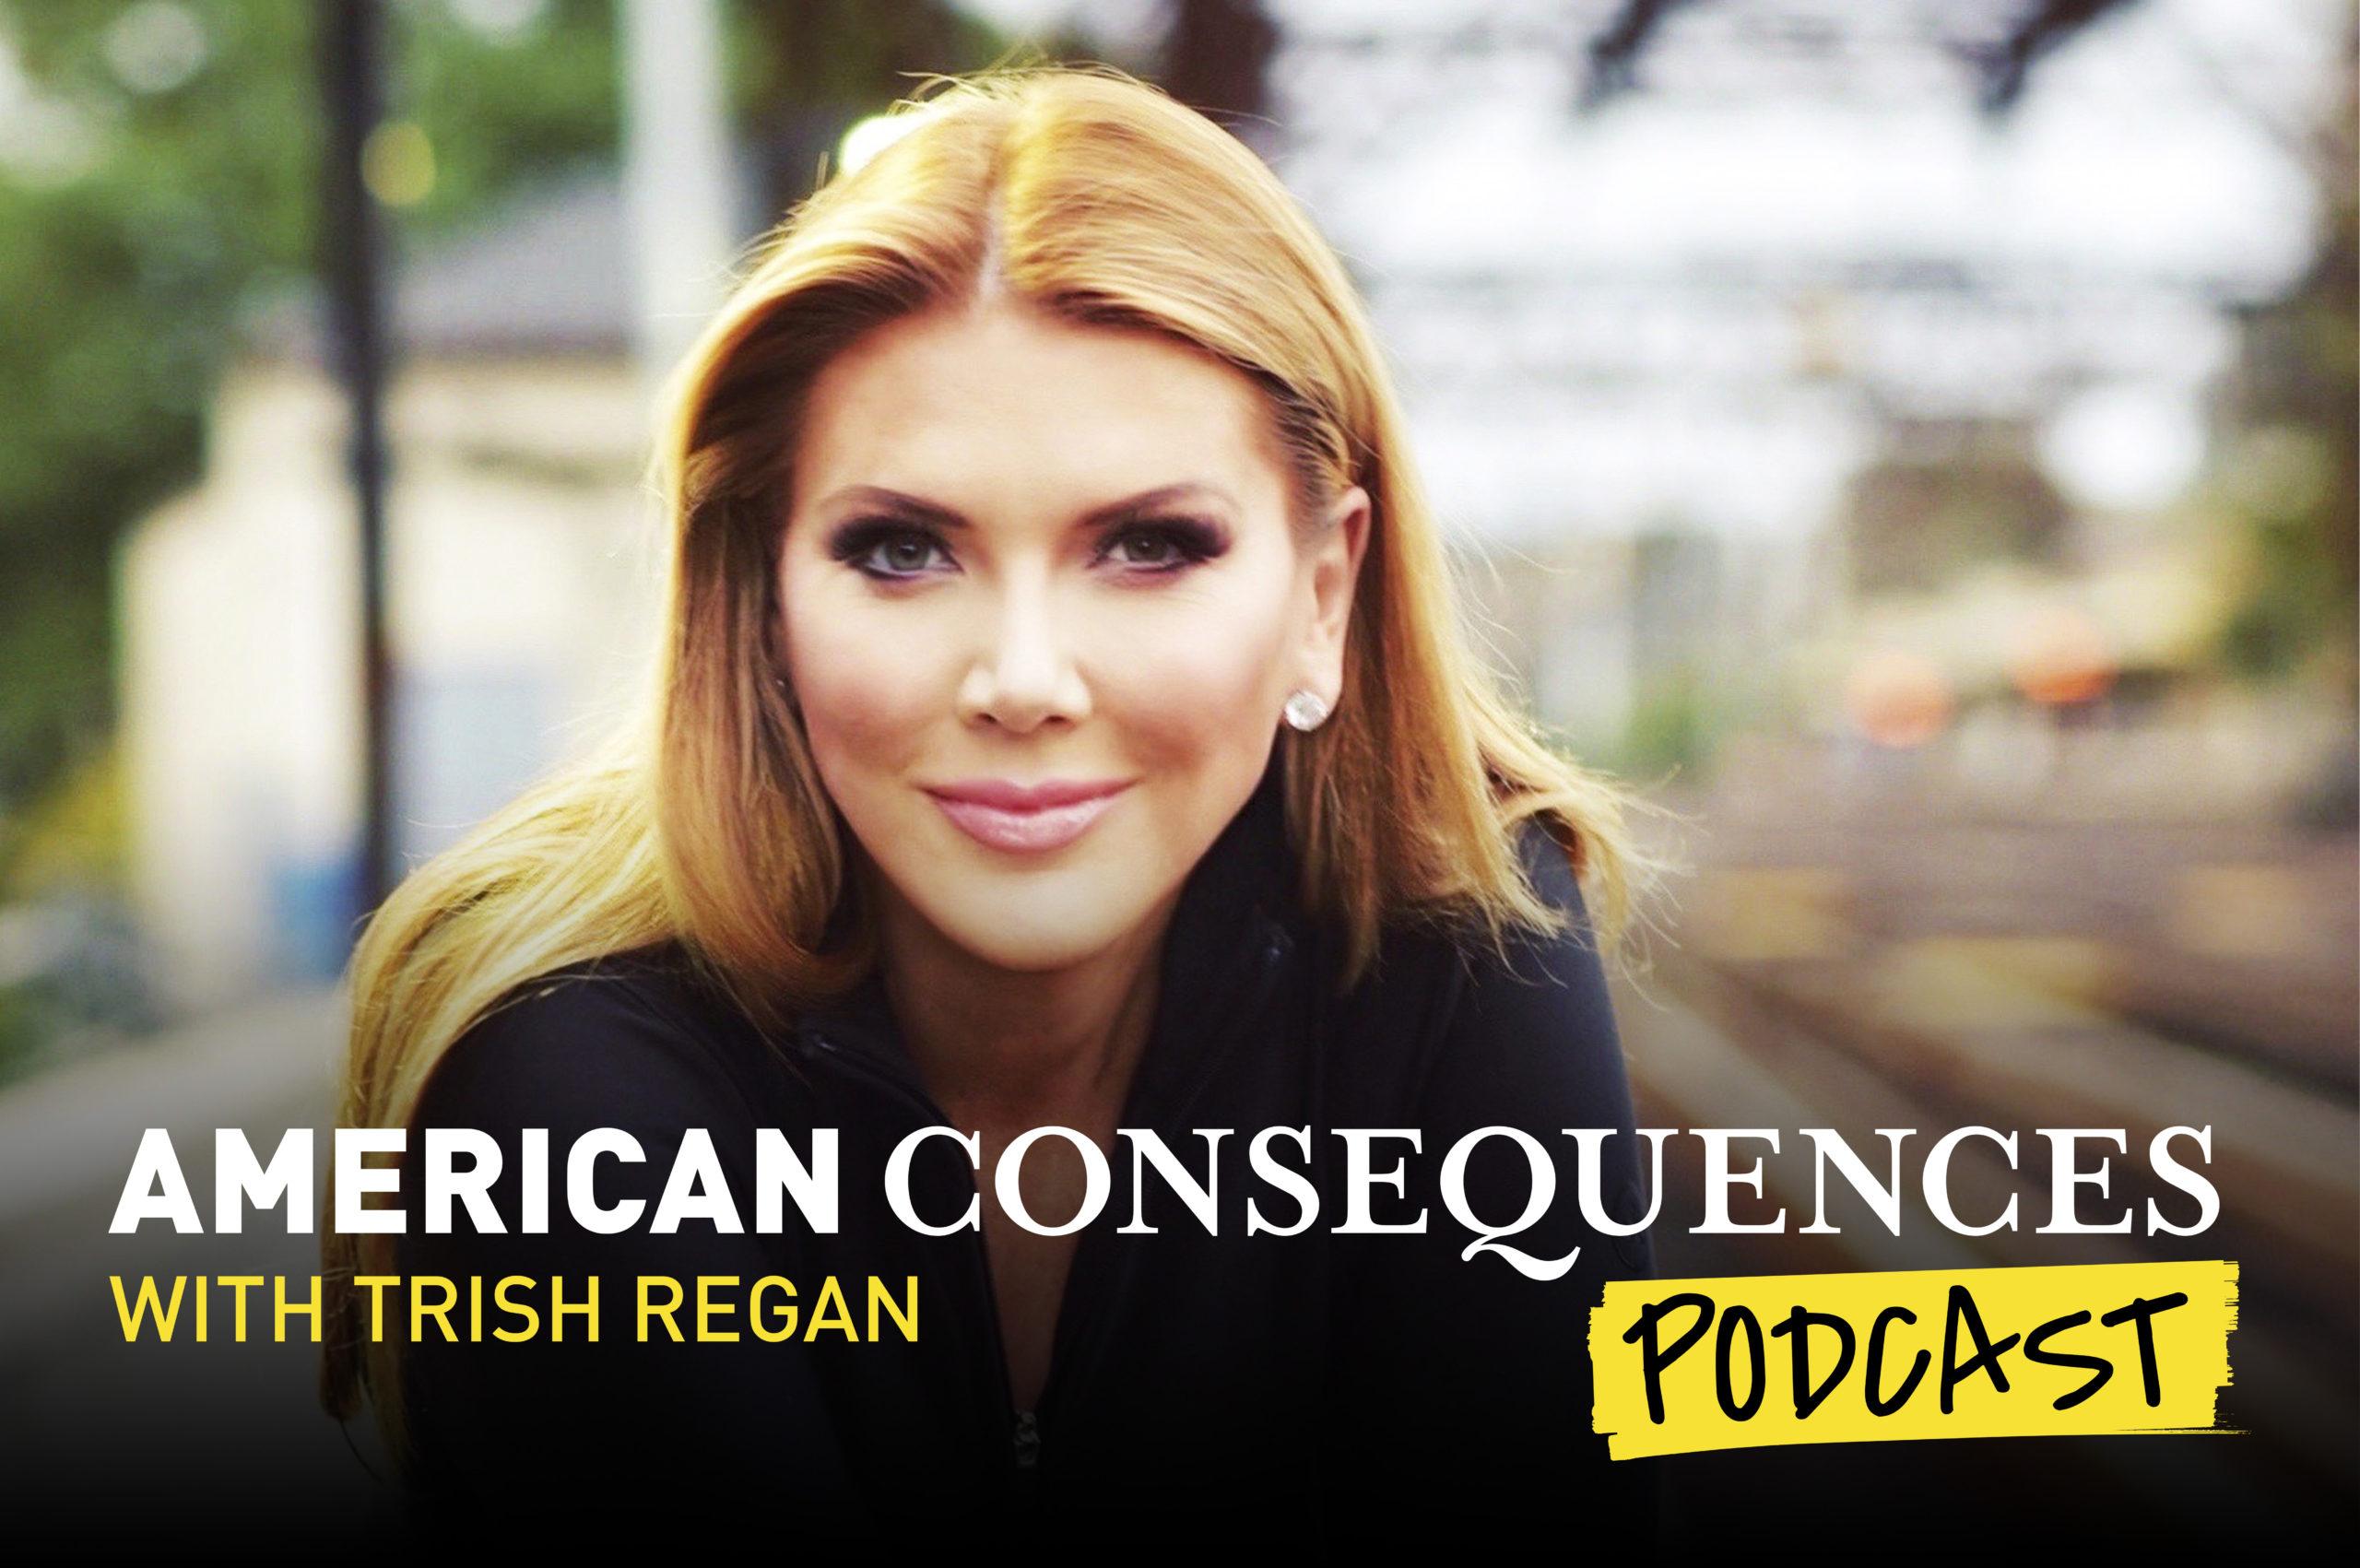 American Consequences With Trish Regan - Trailer